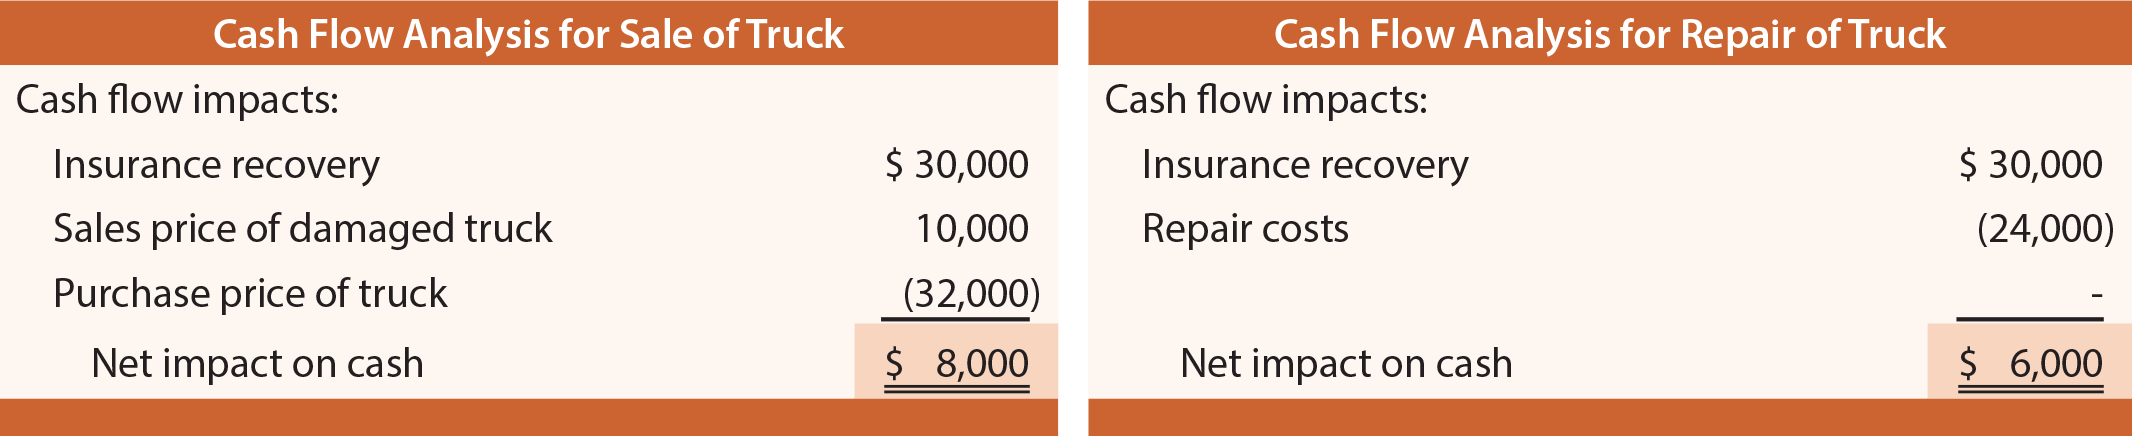 Cash Flow Analysis of Truck